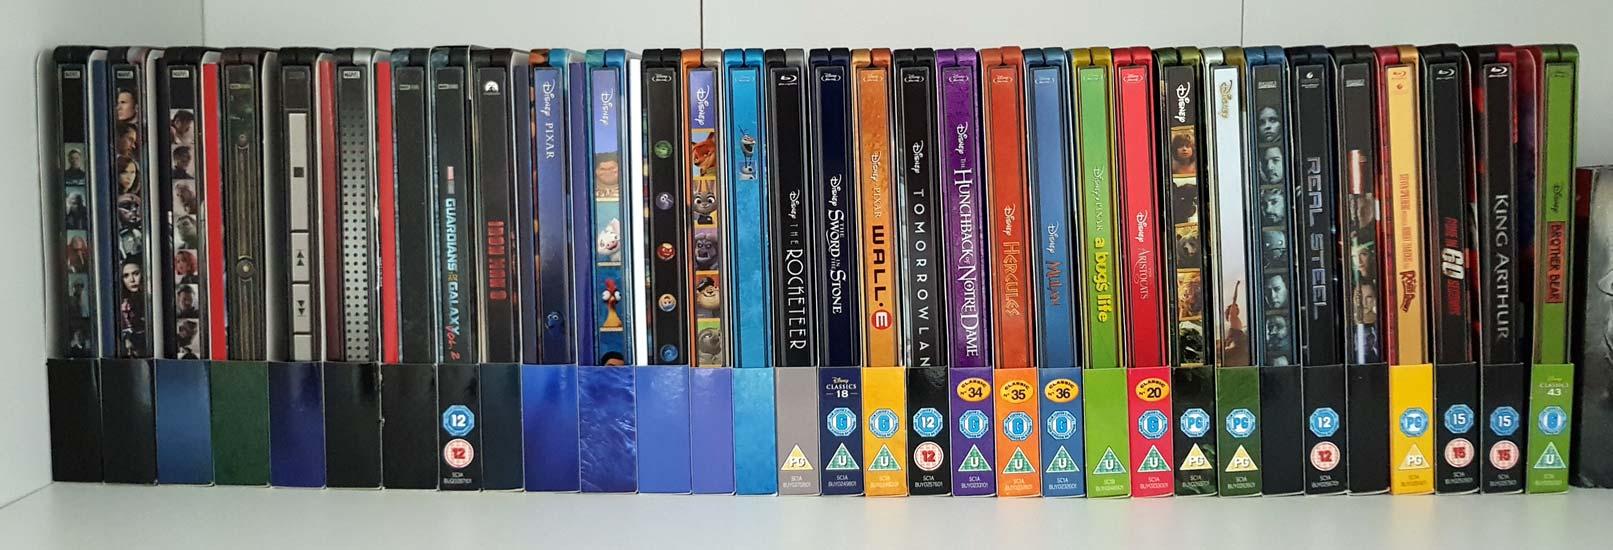 Collection-Didi-steelbooks2